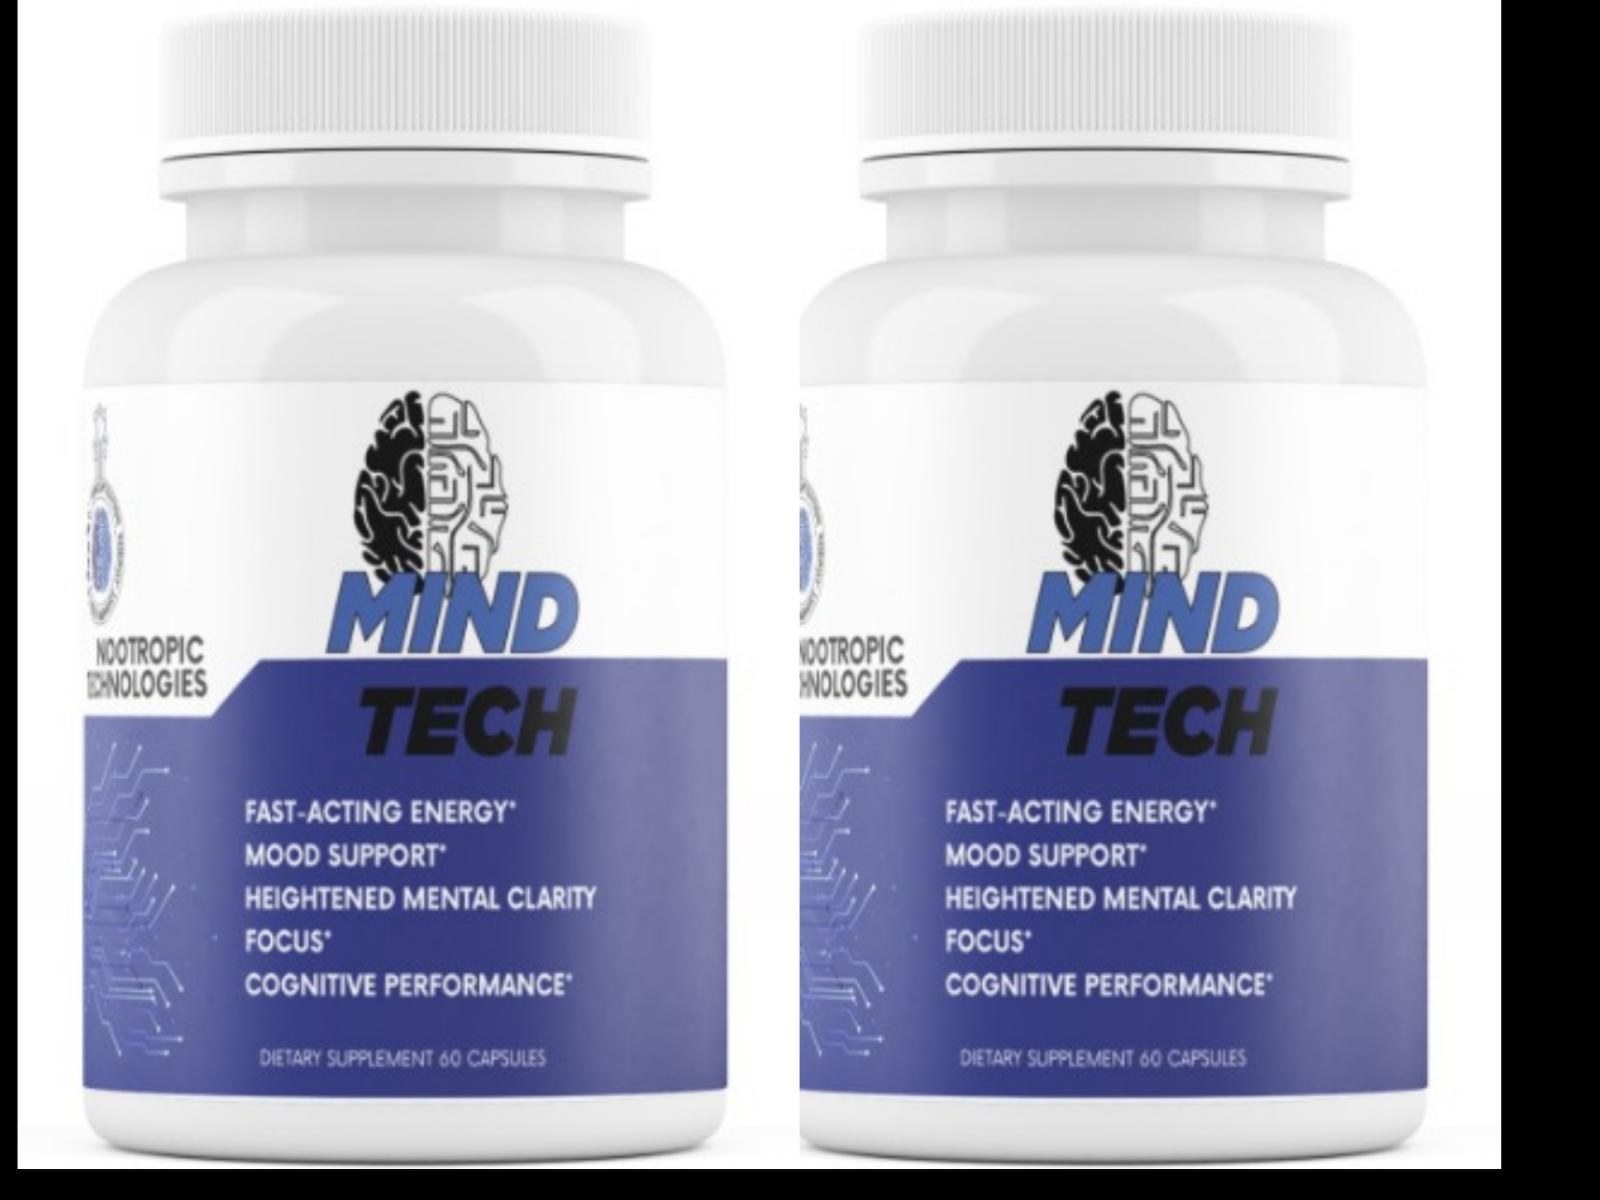 2 Bottles - Mind Tech Nootropic Mindtech Brain Booster Focus Supplement